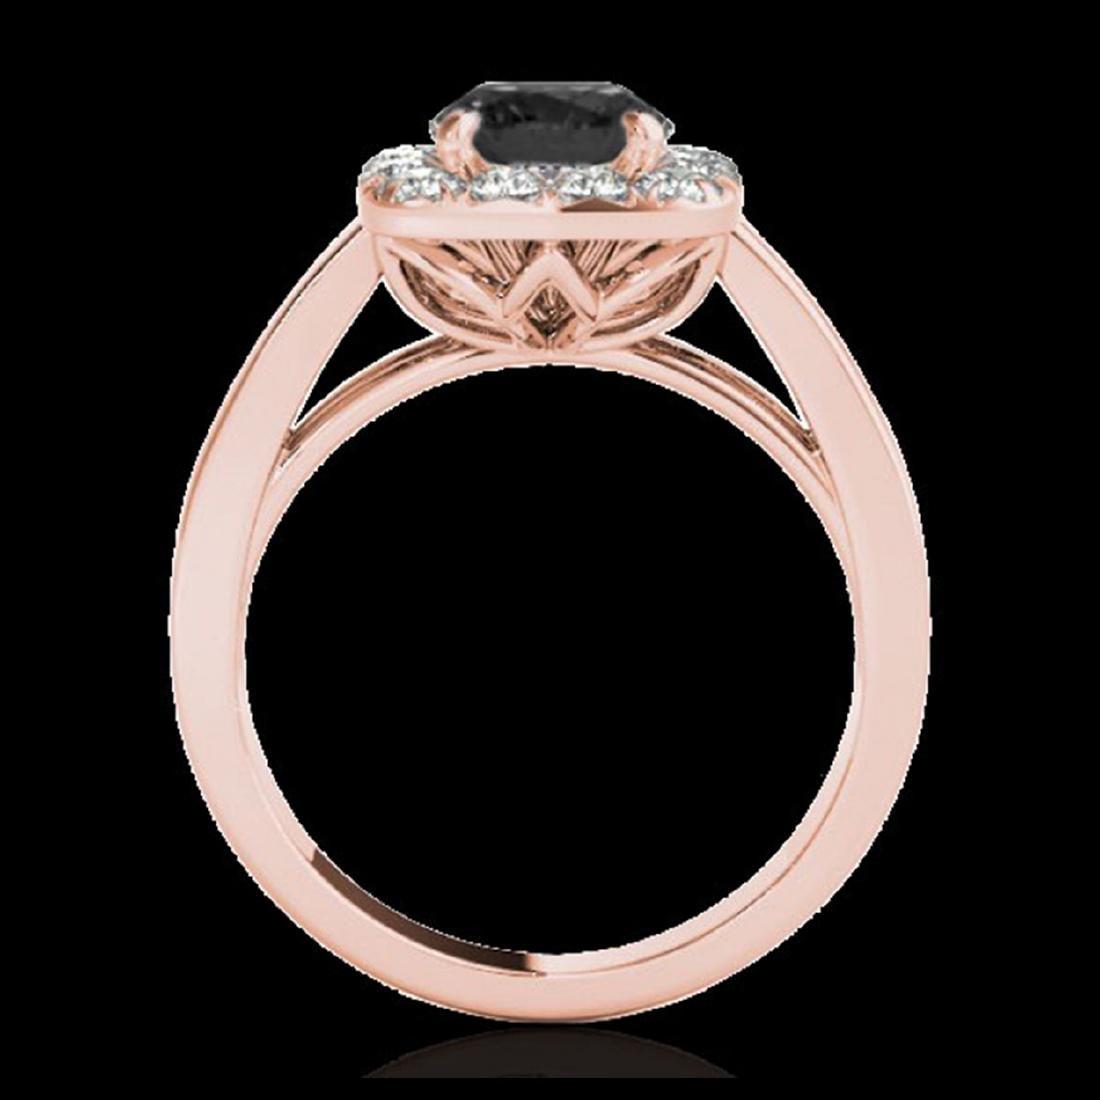 1.55 ctw VS Black Diamond Solitaire Halo Ring 10K Rose - 2